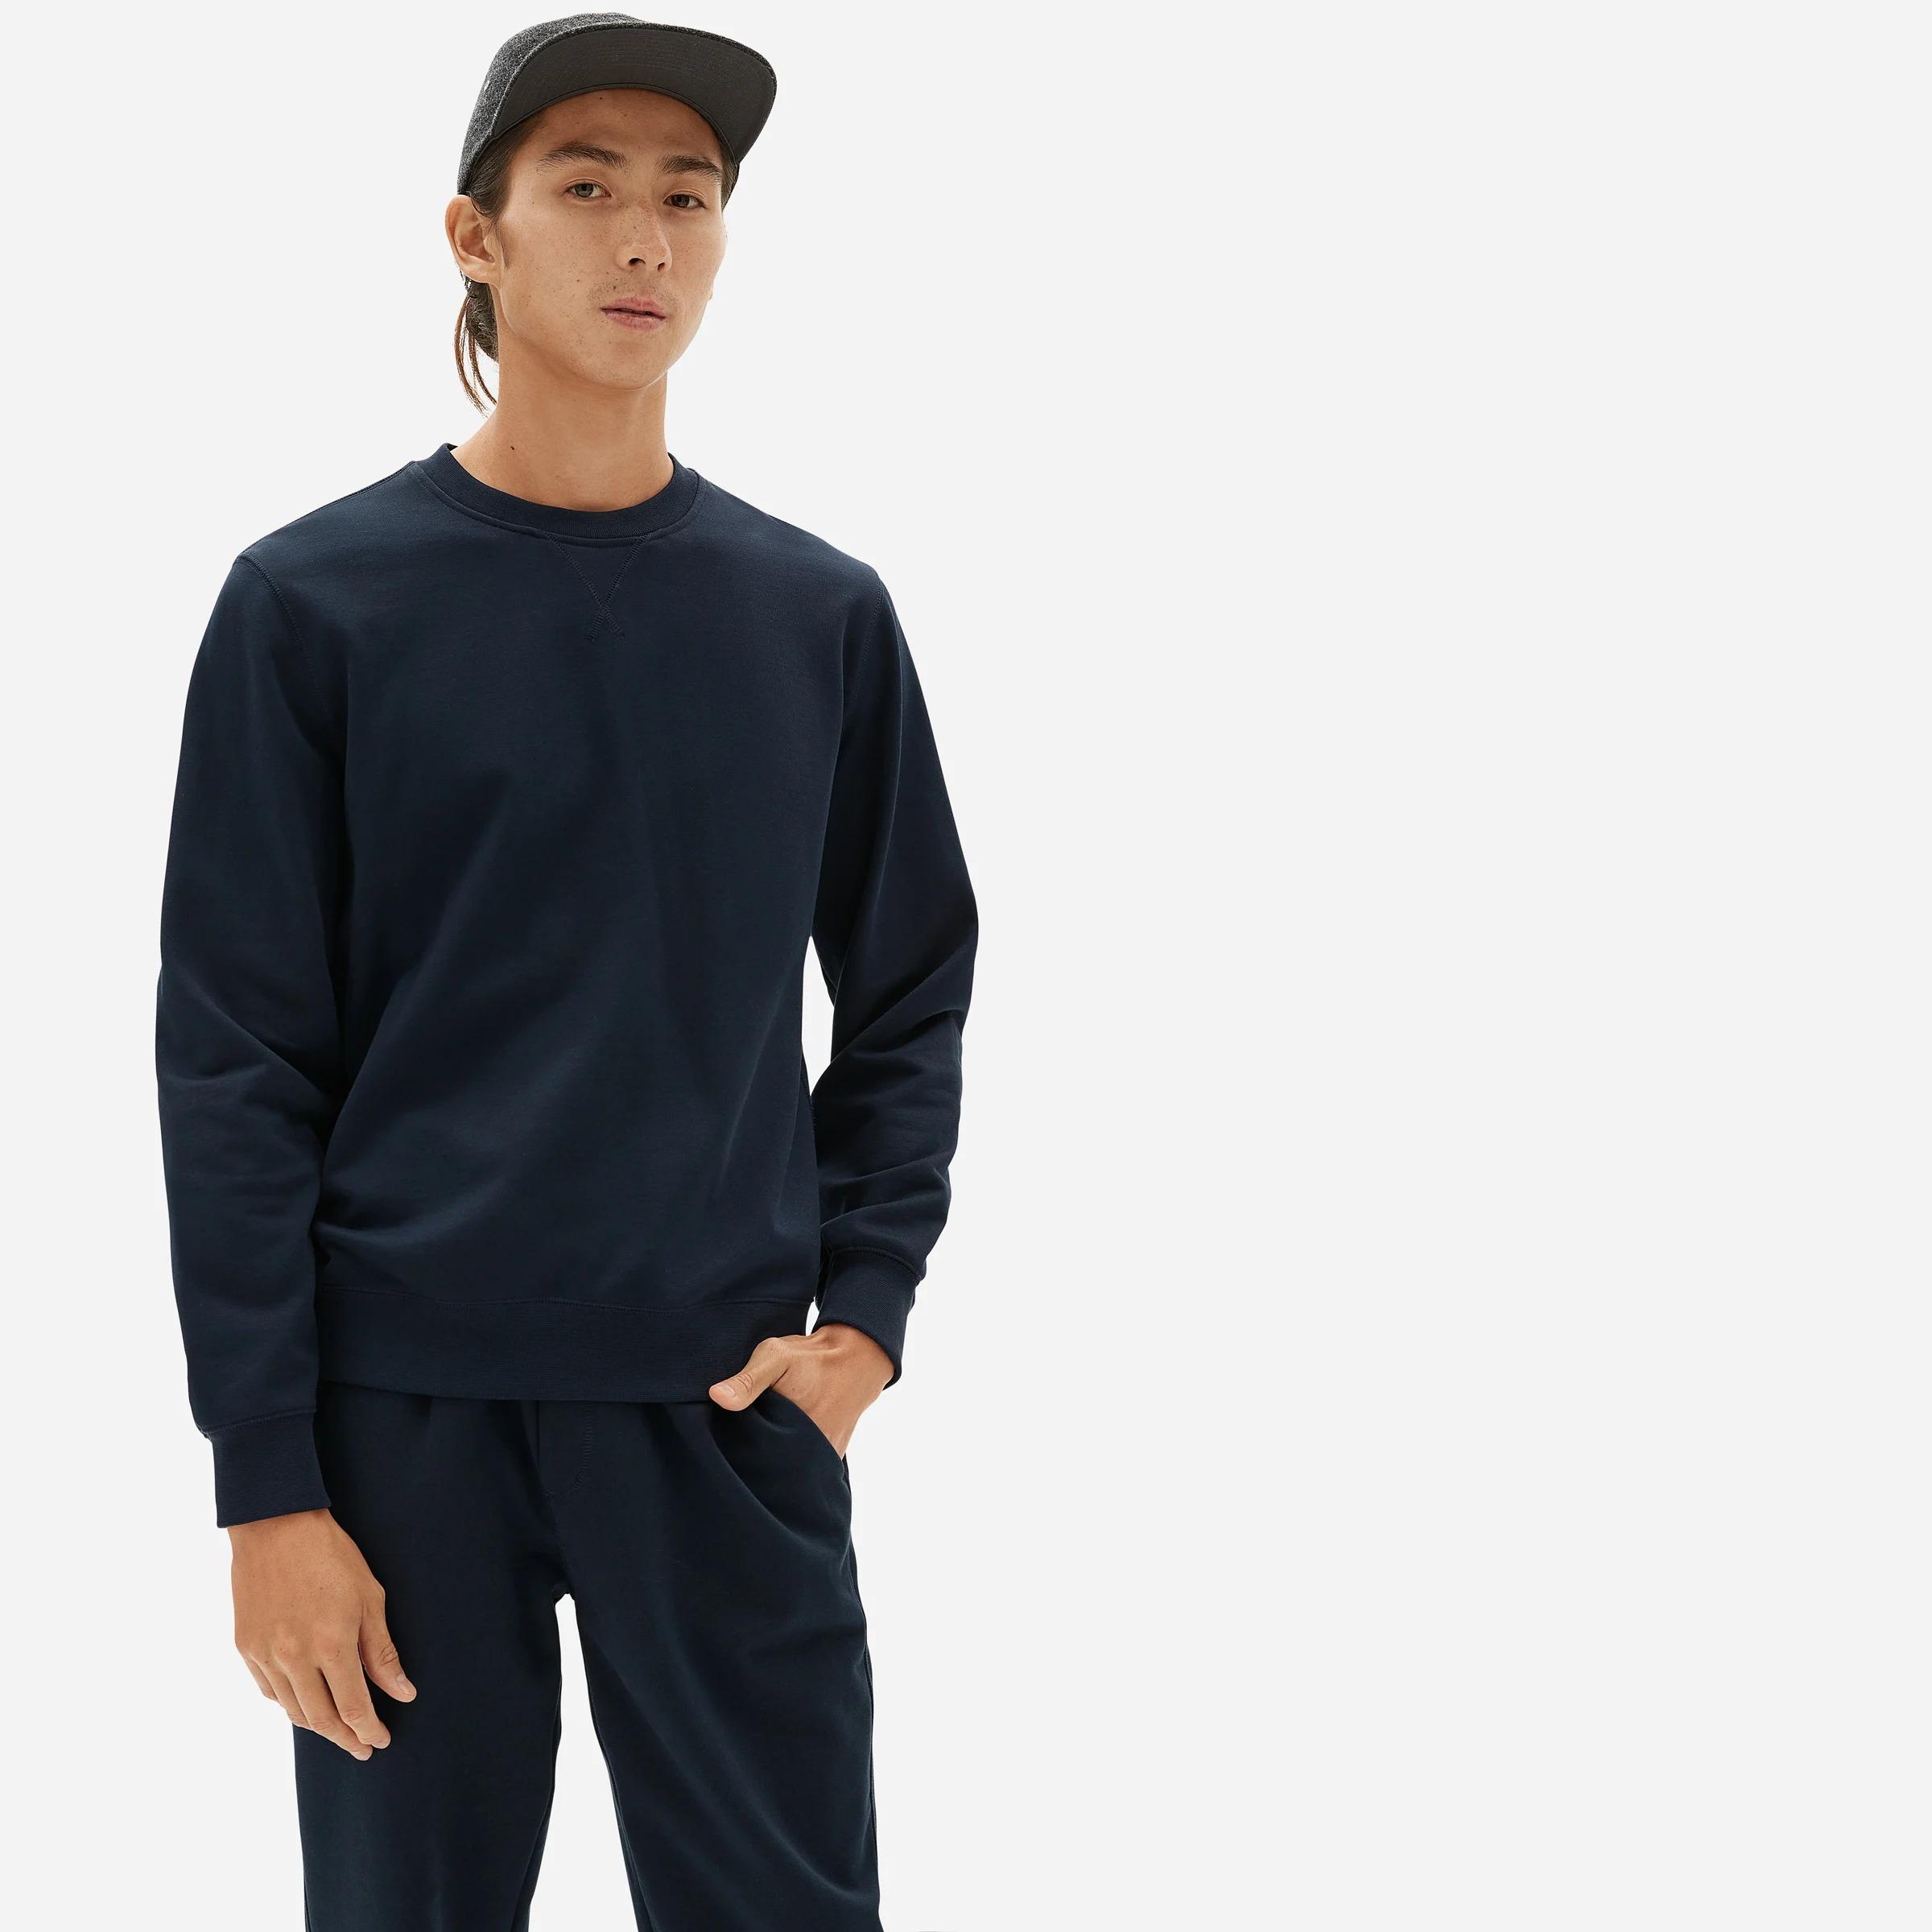 Everlane Uniform French Terry Sweatshirt